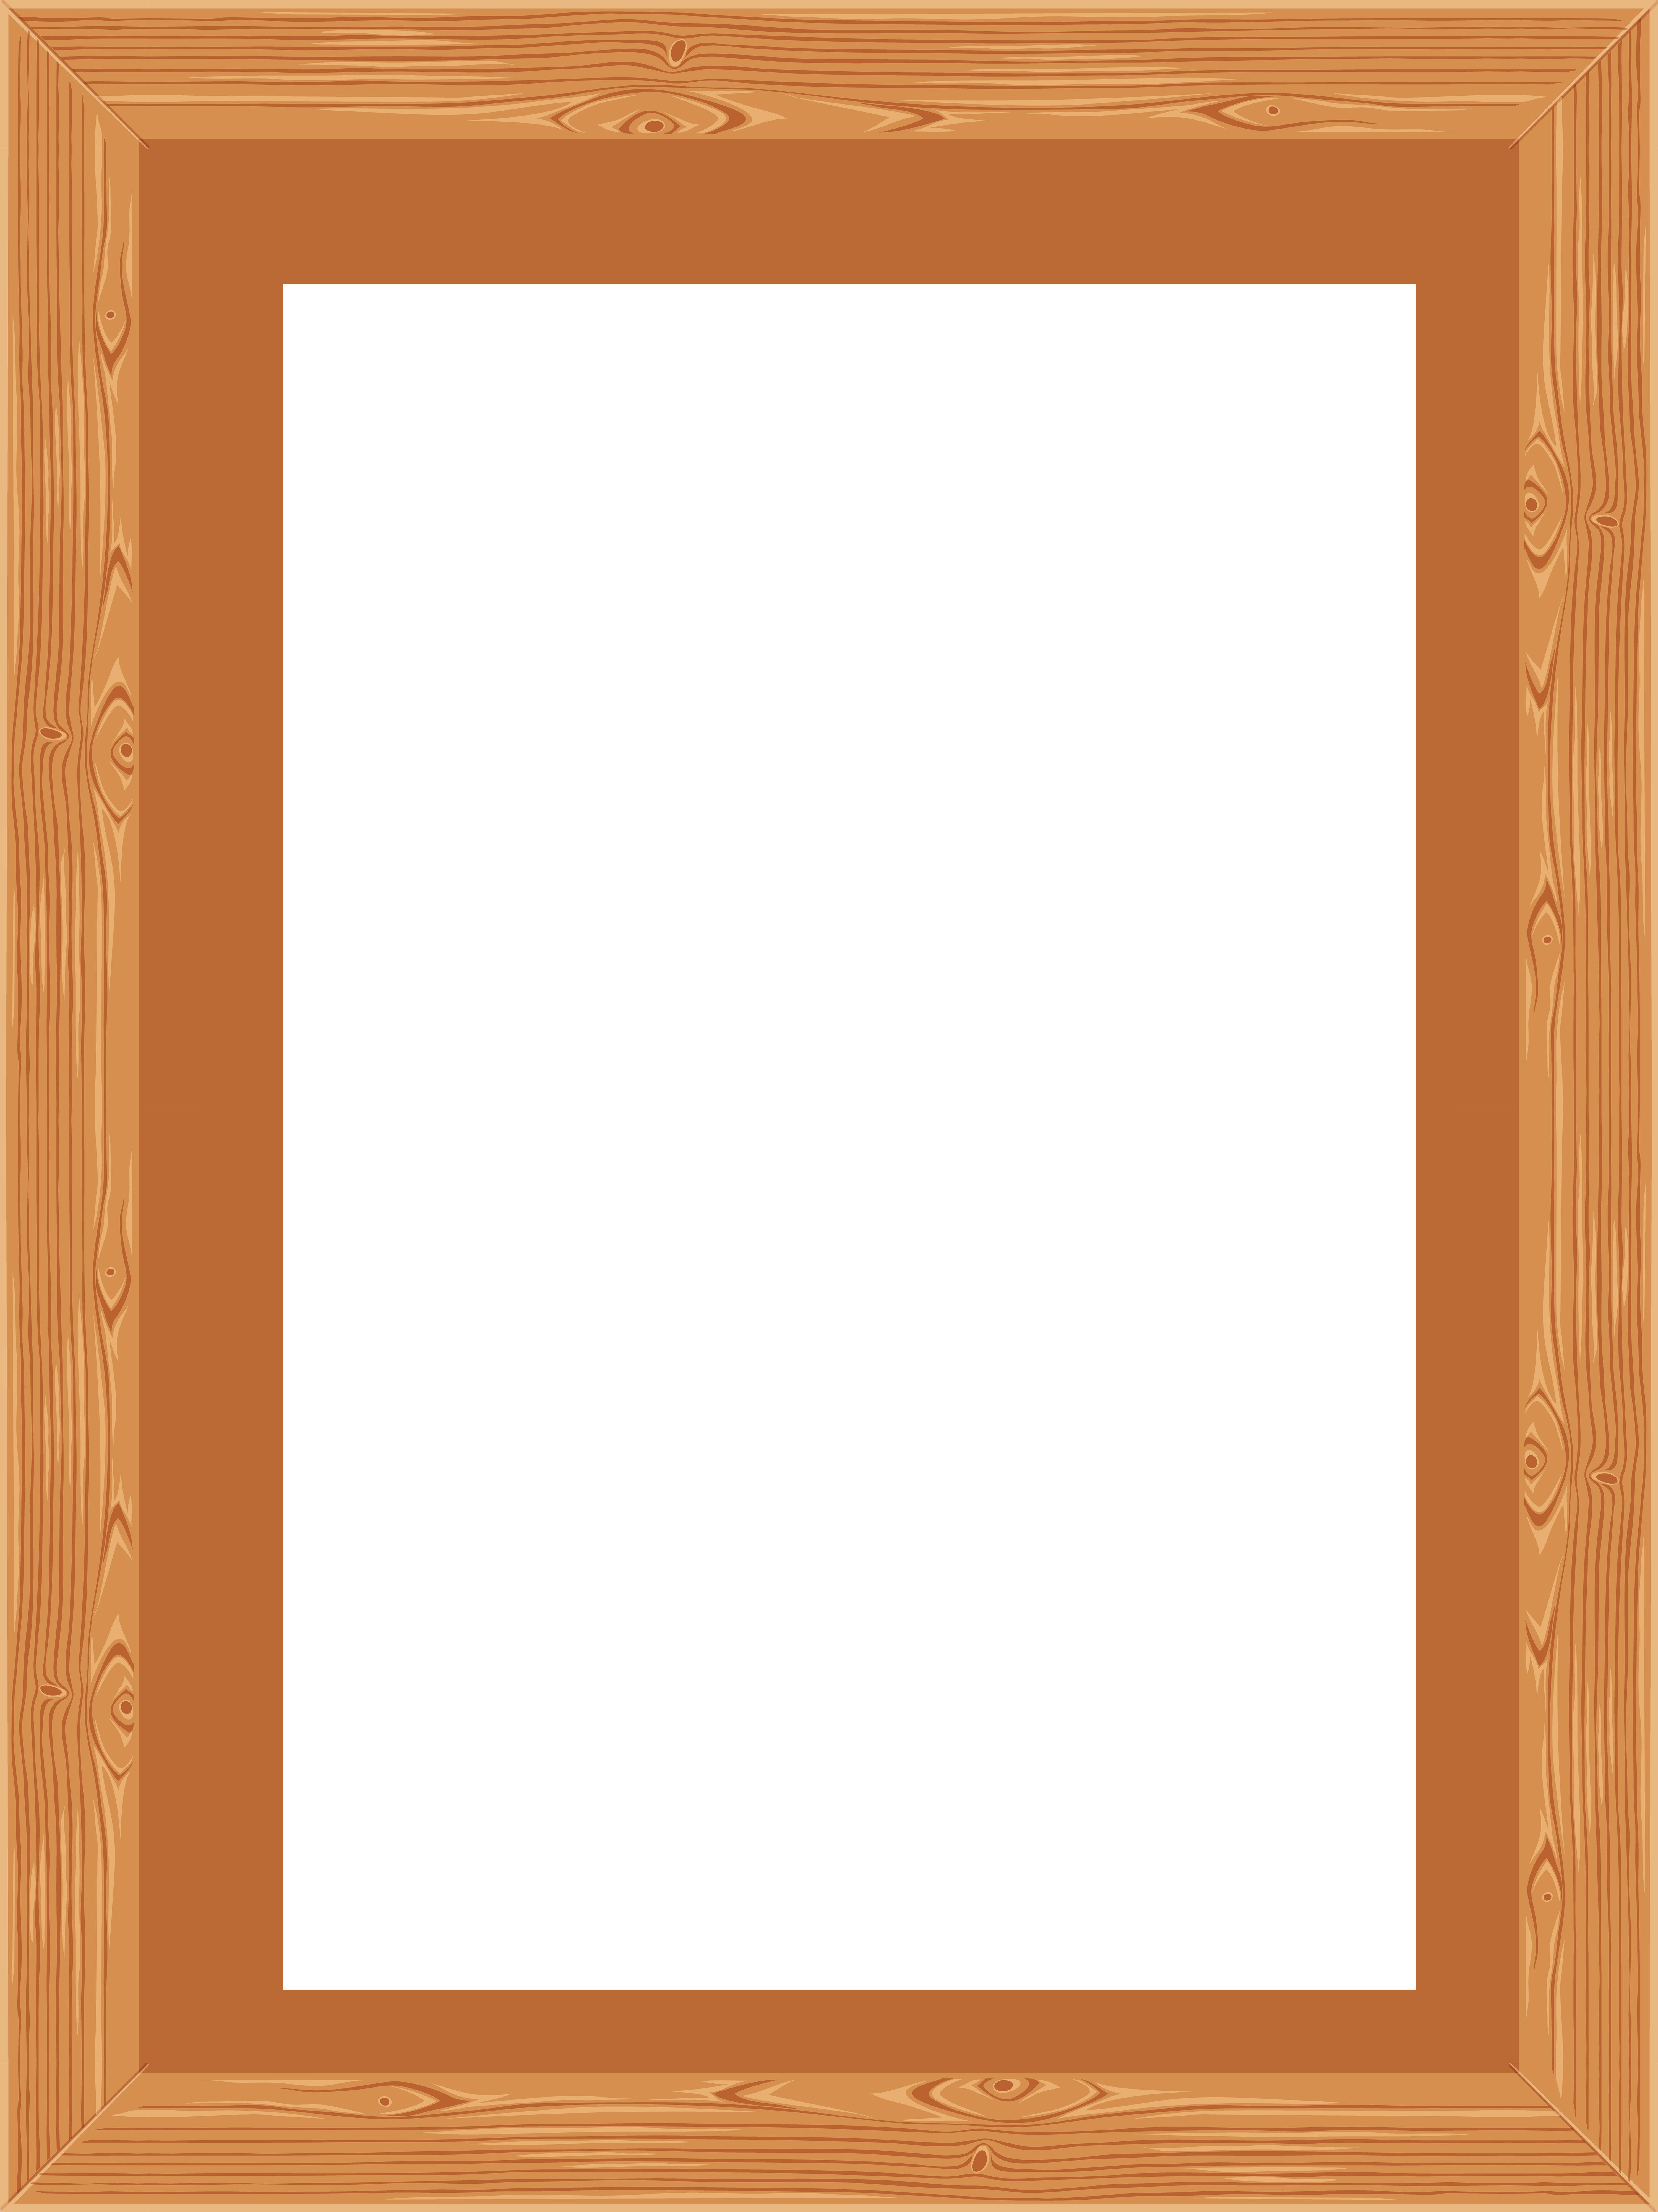 Banner frame png. Transparent classic wooden image